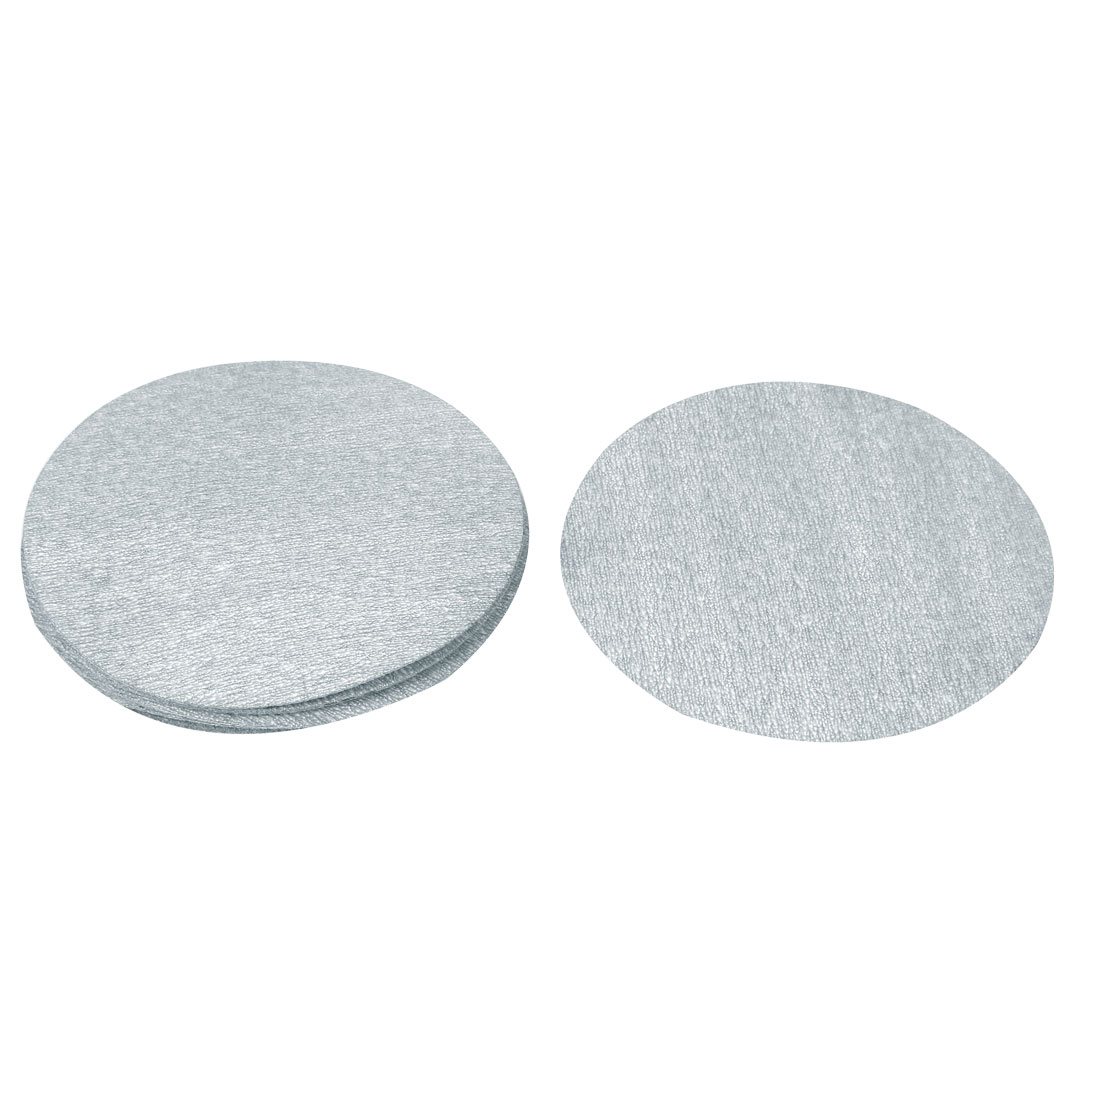 "5"" Dia Polishing Round Dry Abrasive Sanding Sandpaper Sheet Disc 1000 Grit 10pcs"